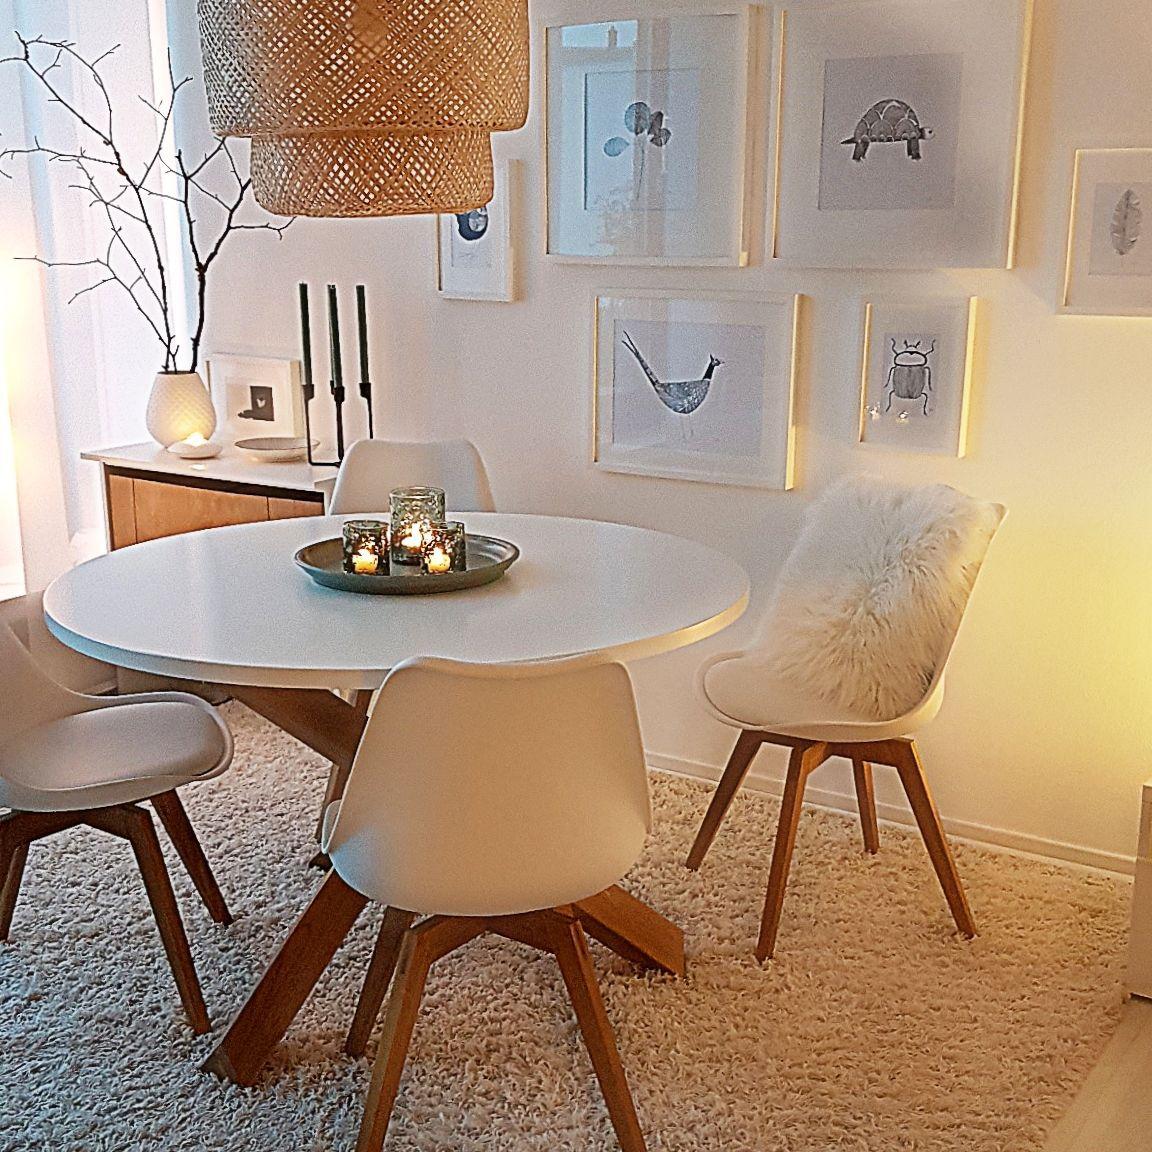 do it yourself ideen f r dein zuhause seite 32. Black Bedroom Furniture Sets. Home Design Ideas